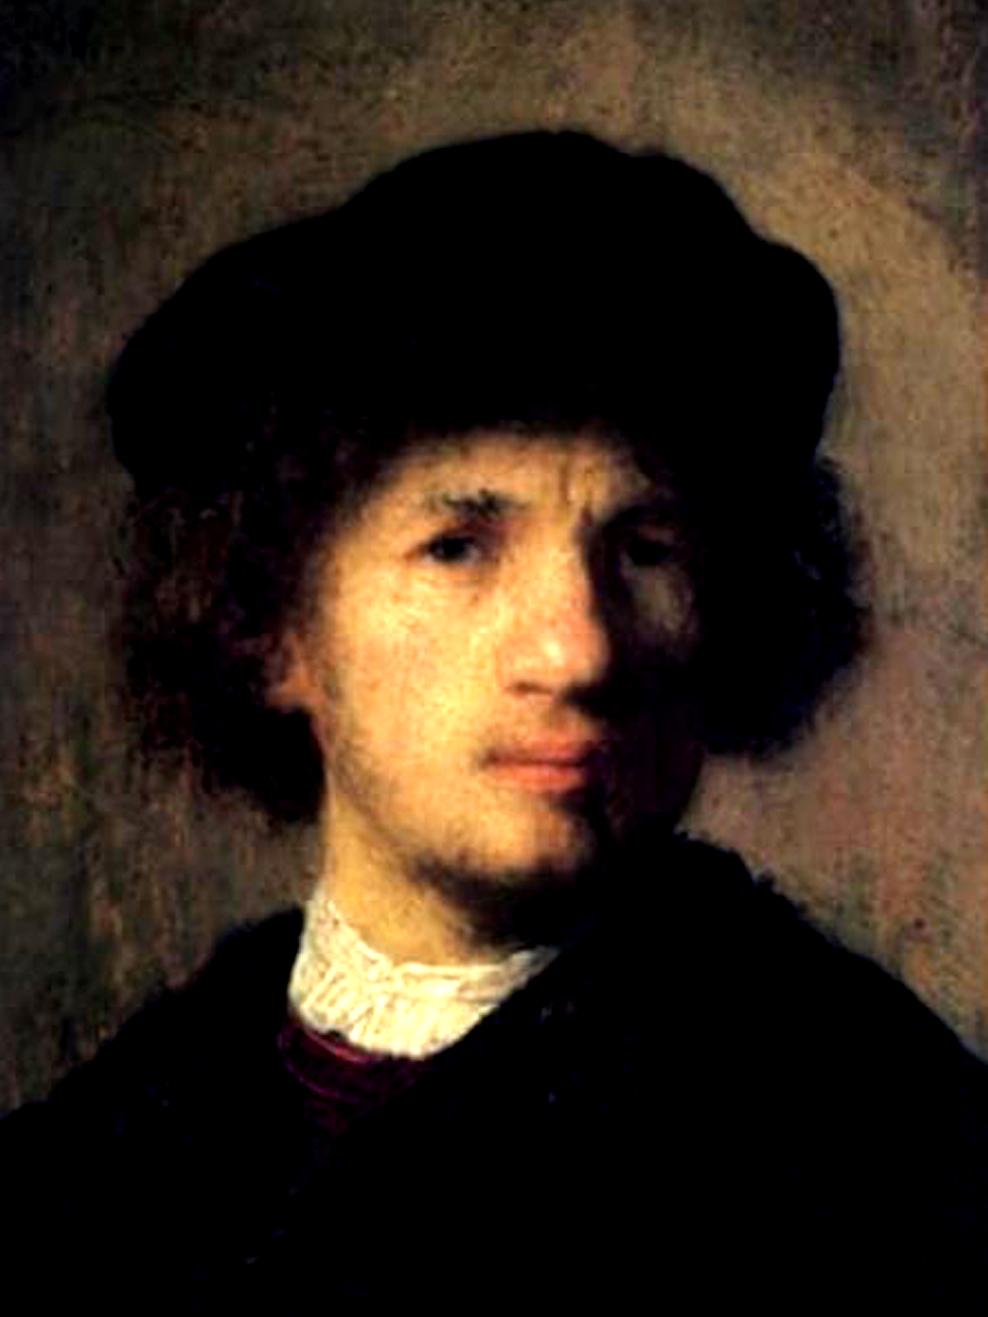 Rembrandt self-portrait. Image Credit: EPA, 2019.